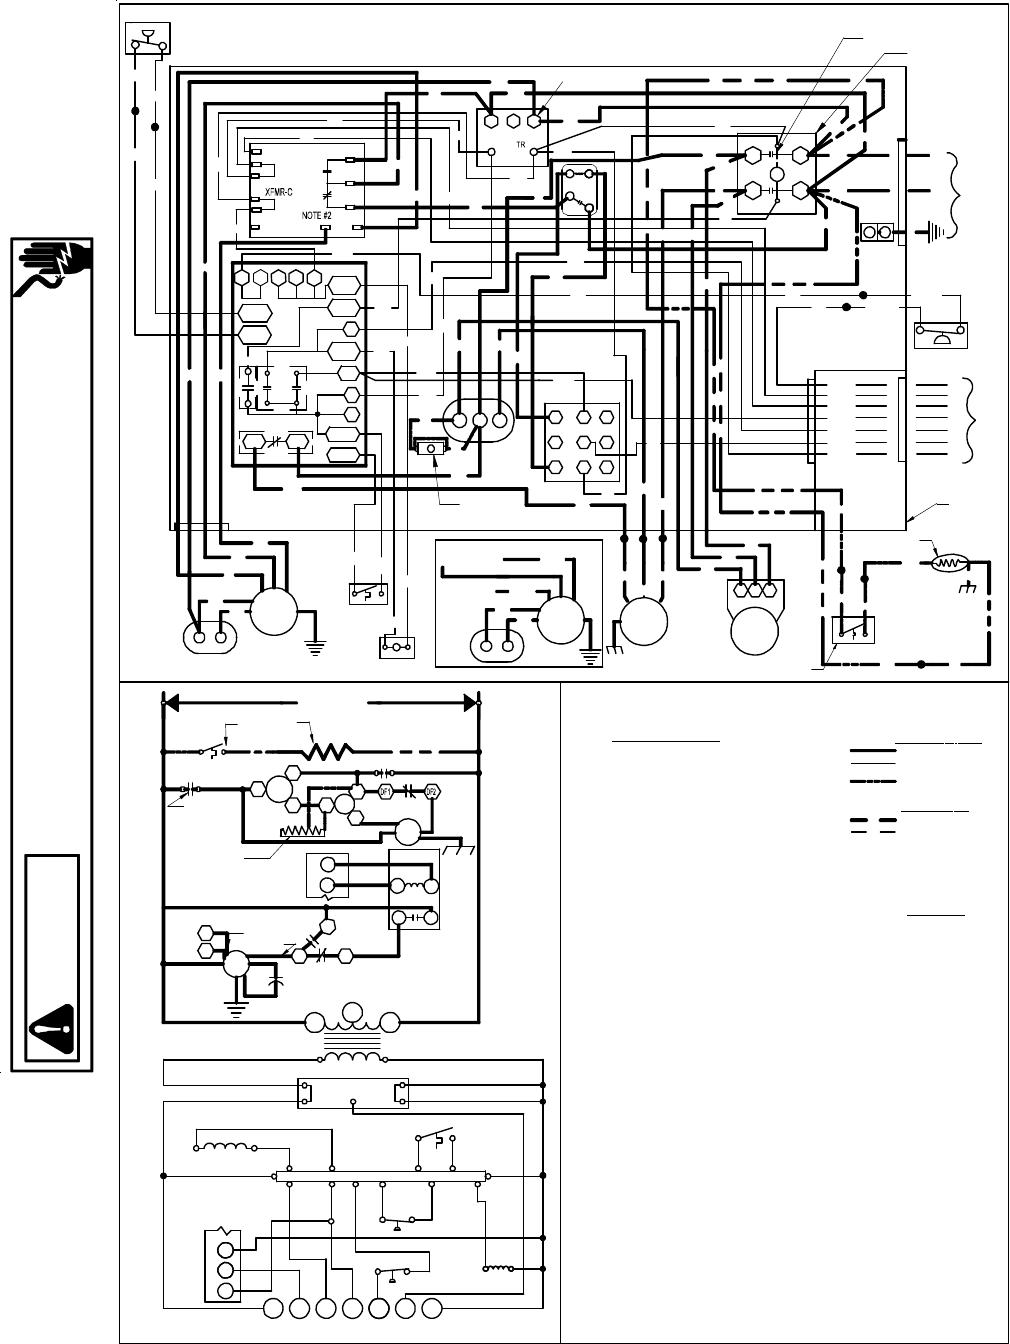 DO_6814] Micro Thermostat Wiring Diagram Free PictureMonoc Exmet Mohammedshrine Librar Wiring 101